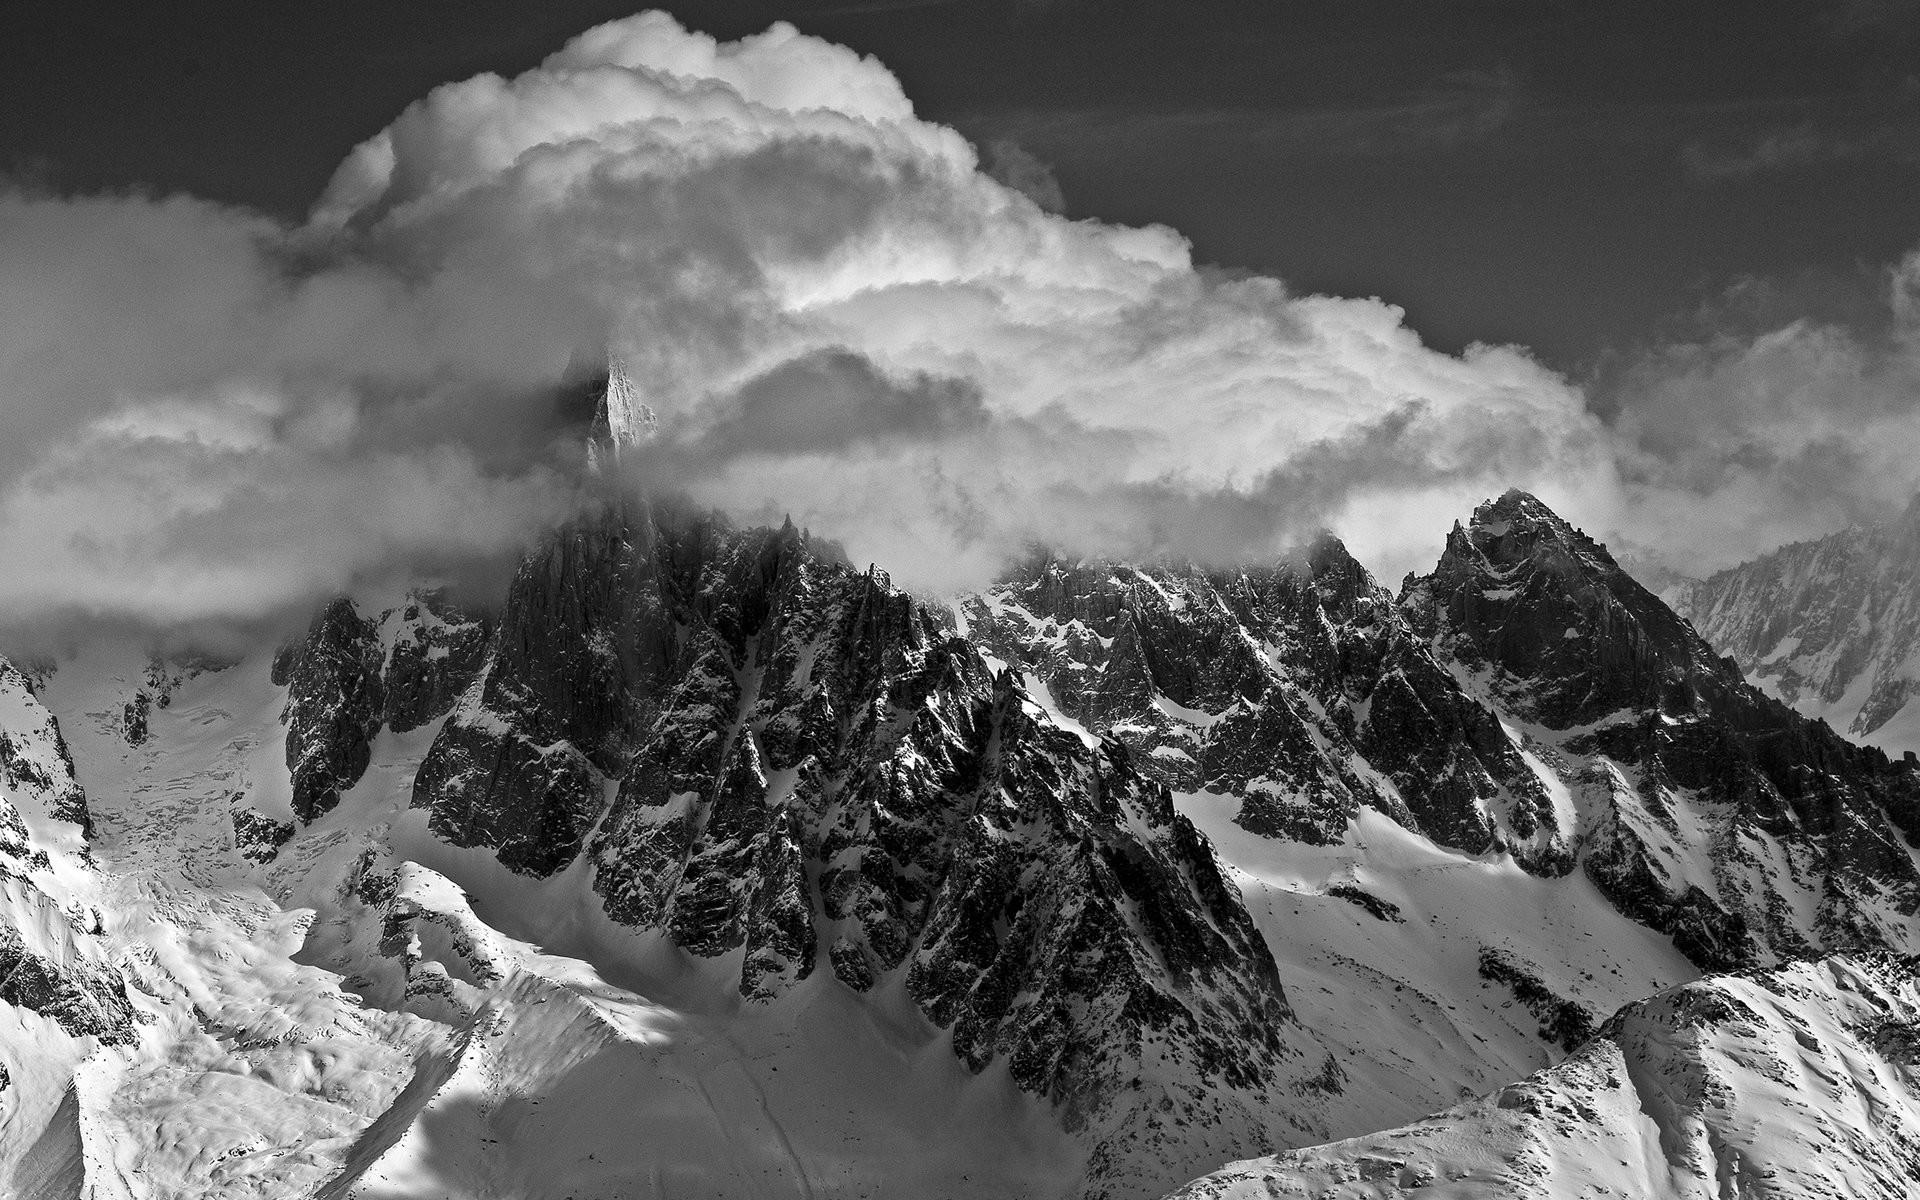 … nature-landscapes-mountains-monochrome-black-white-sky-clouds- …